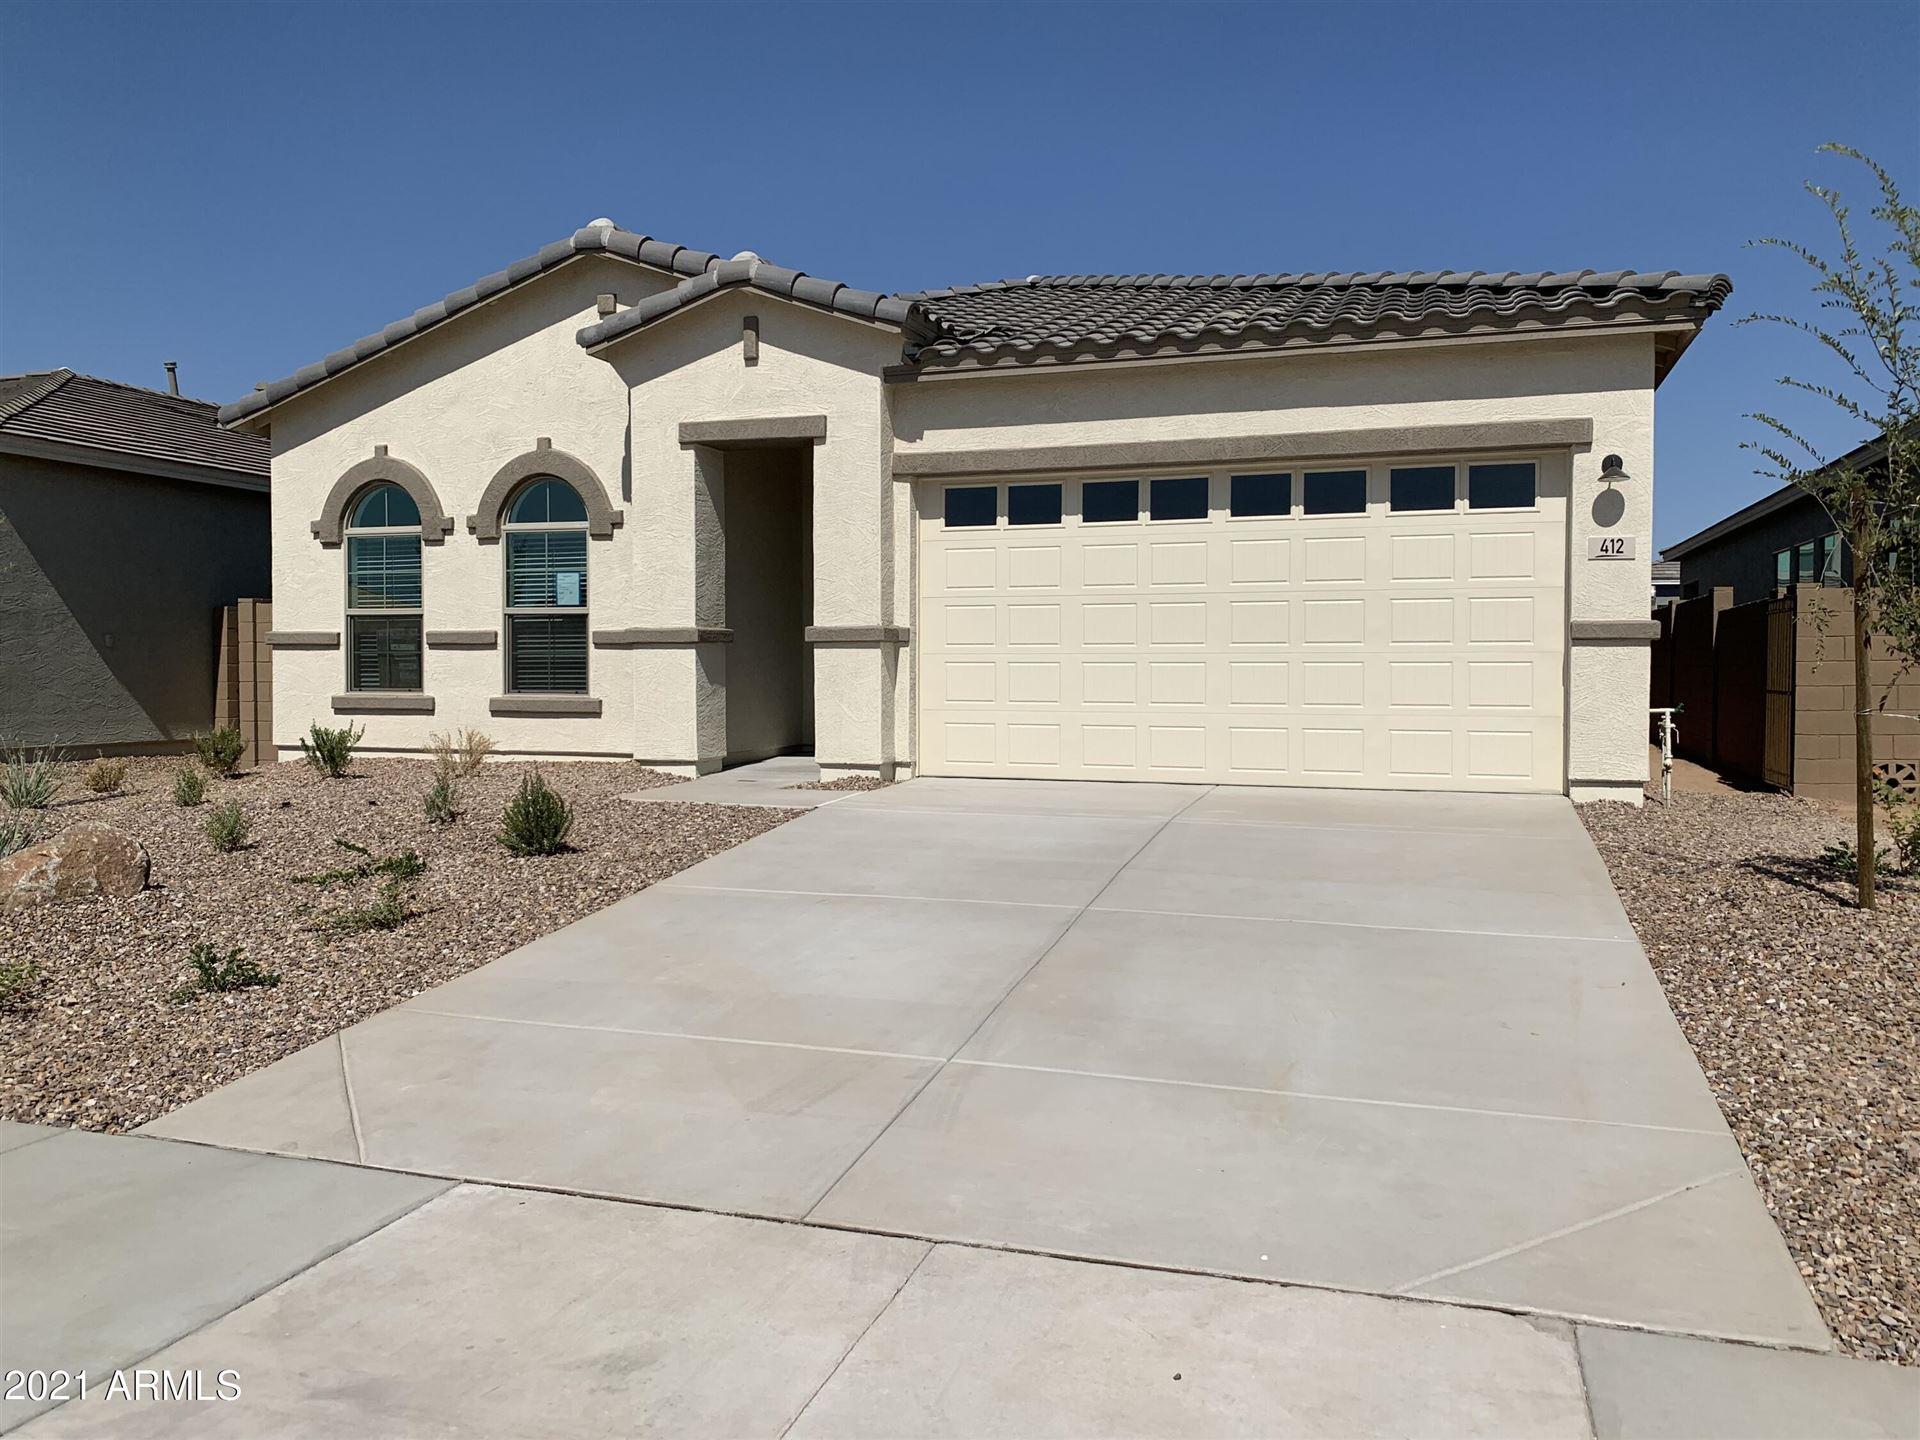 Photo of 412 W GOLDEN ASPEN Drive, San Tan Valley, AZ 85140 (MLS # 6250016)